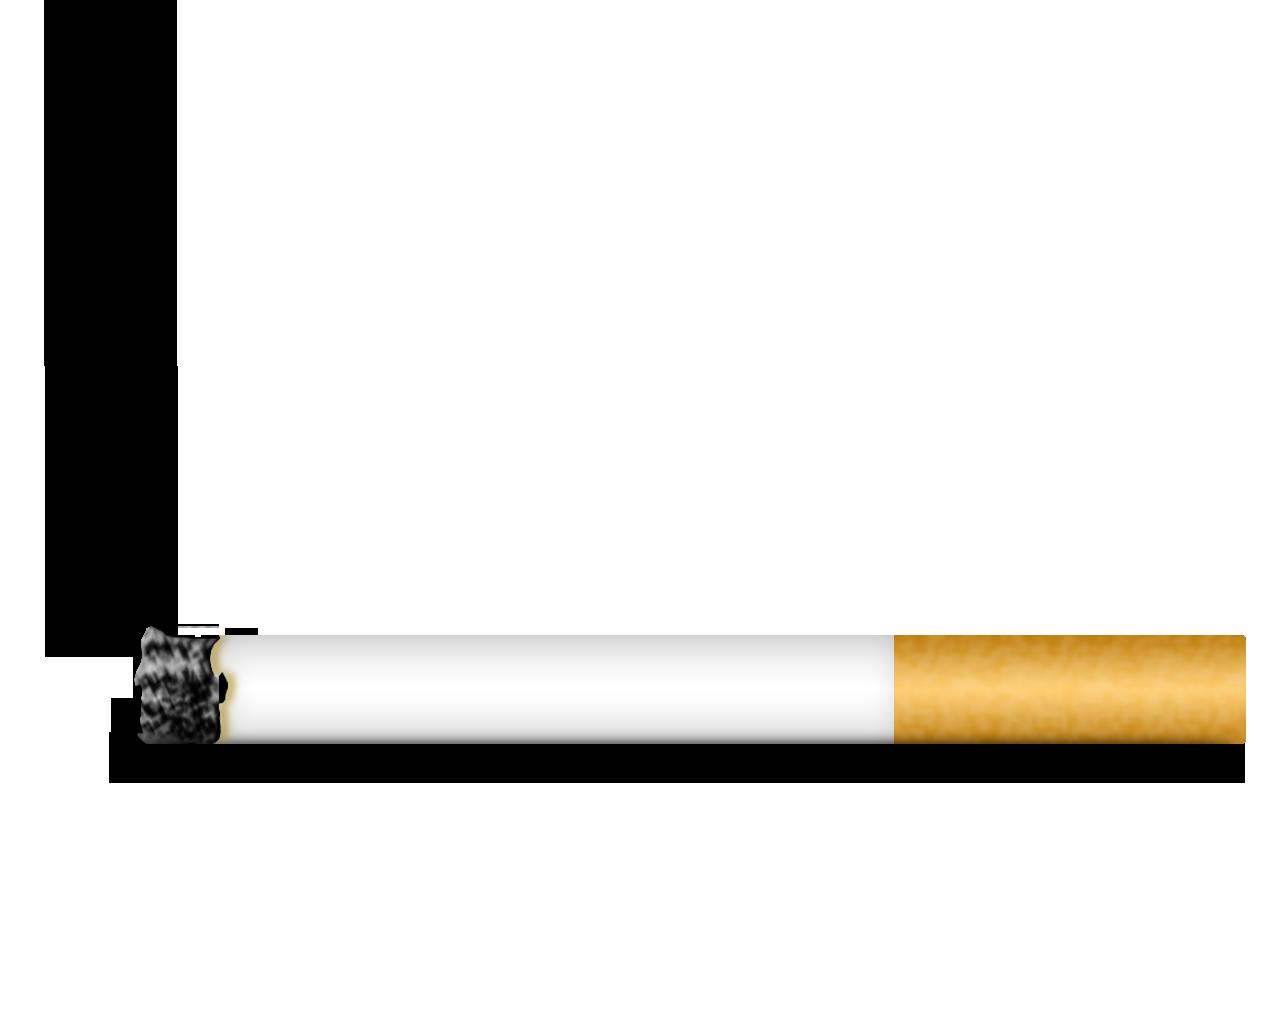 Cigarette PNG Image.